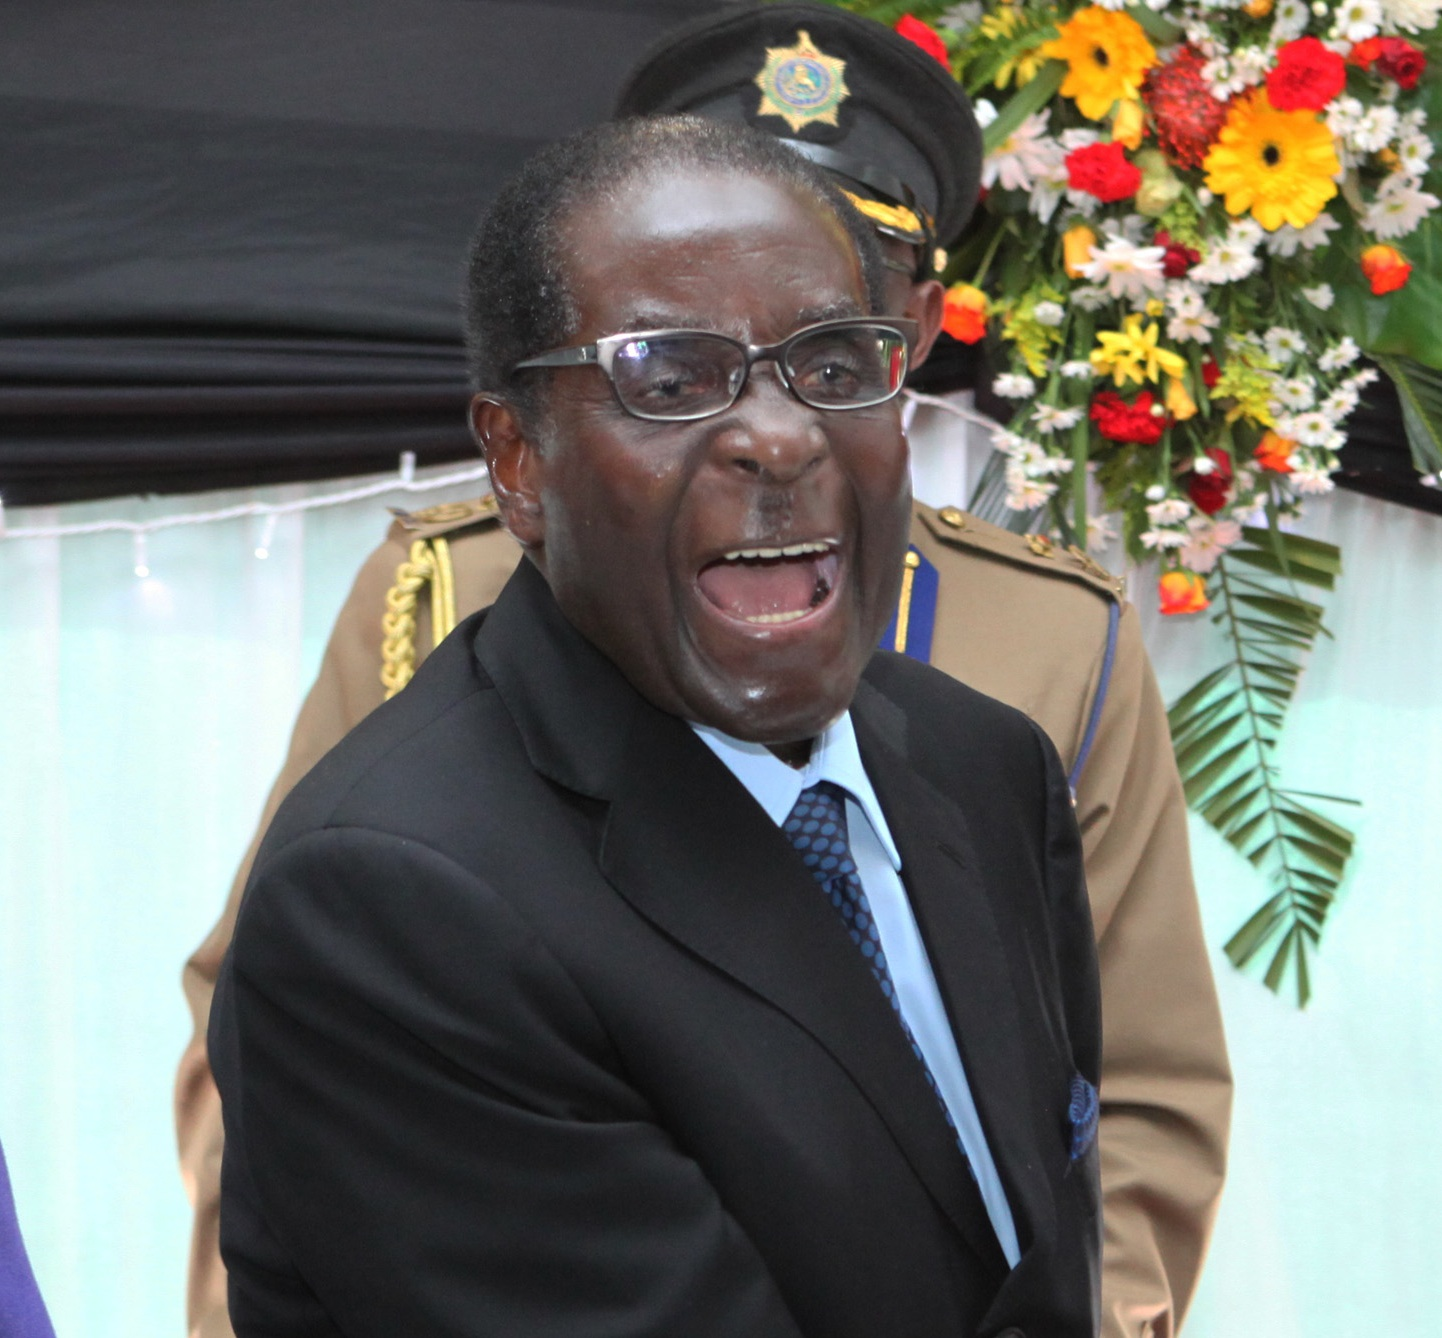 President of Zimbabwe, Robert Mugabe